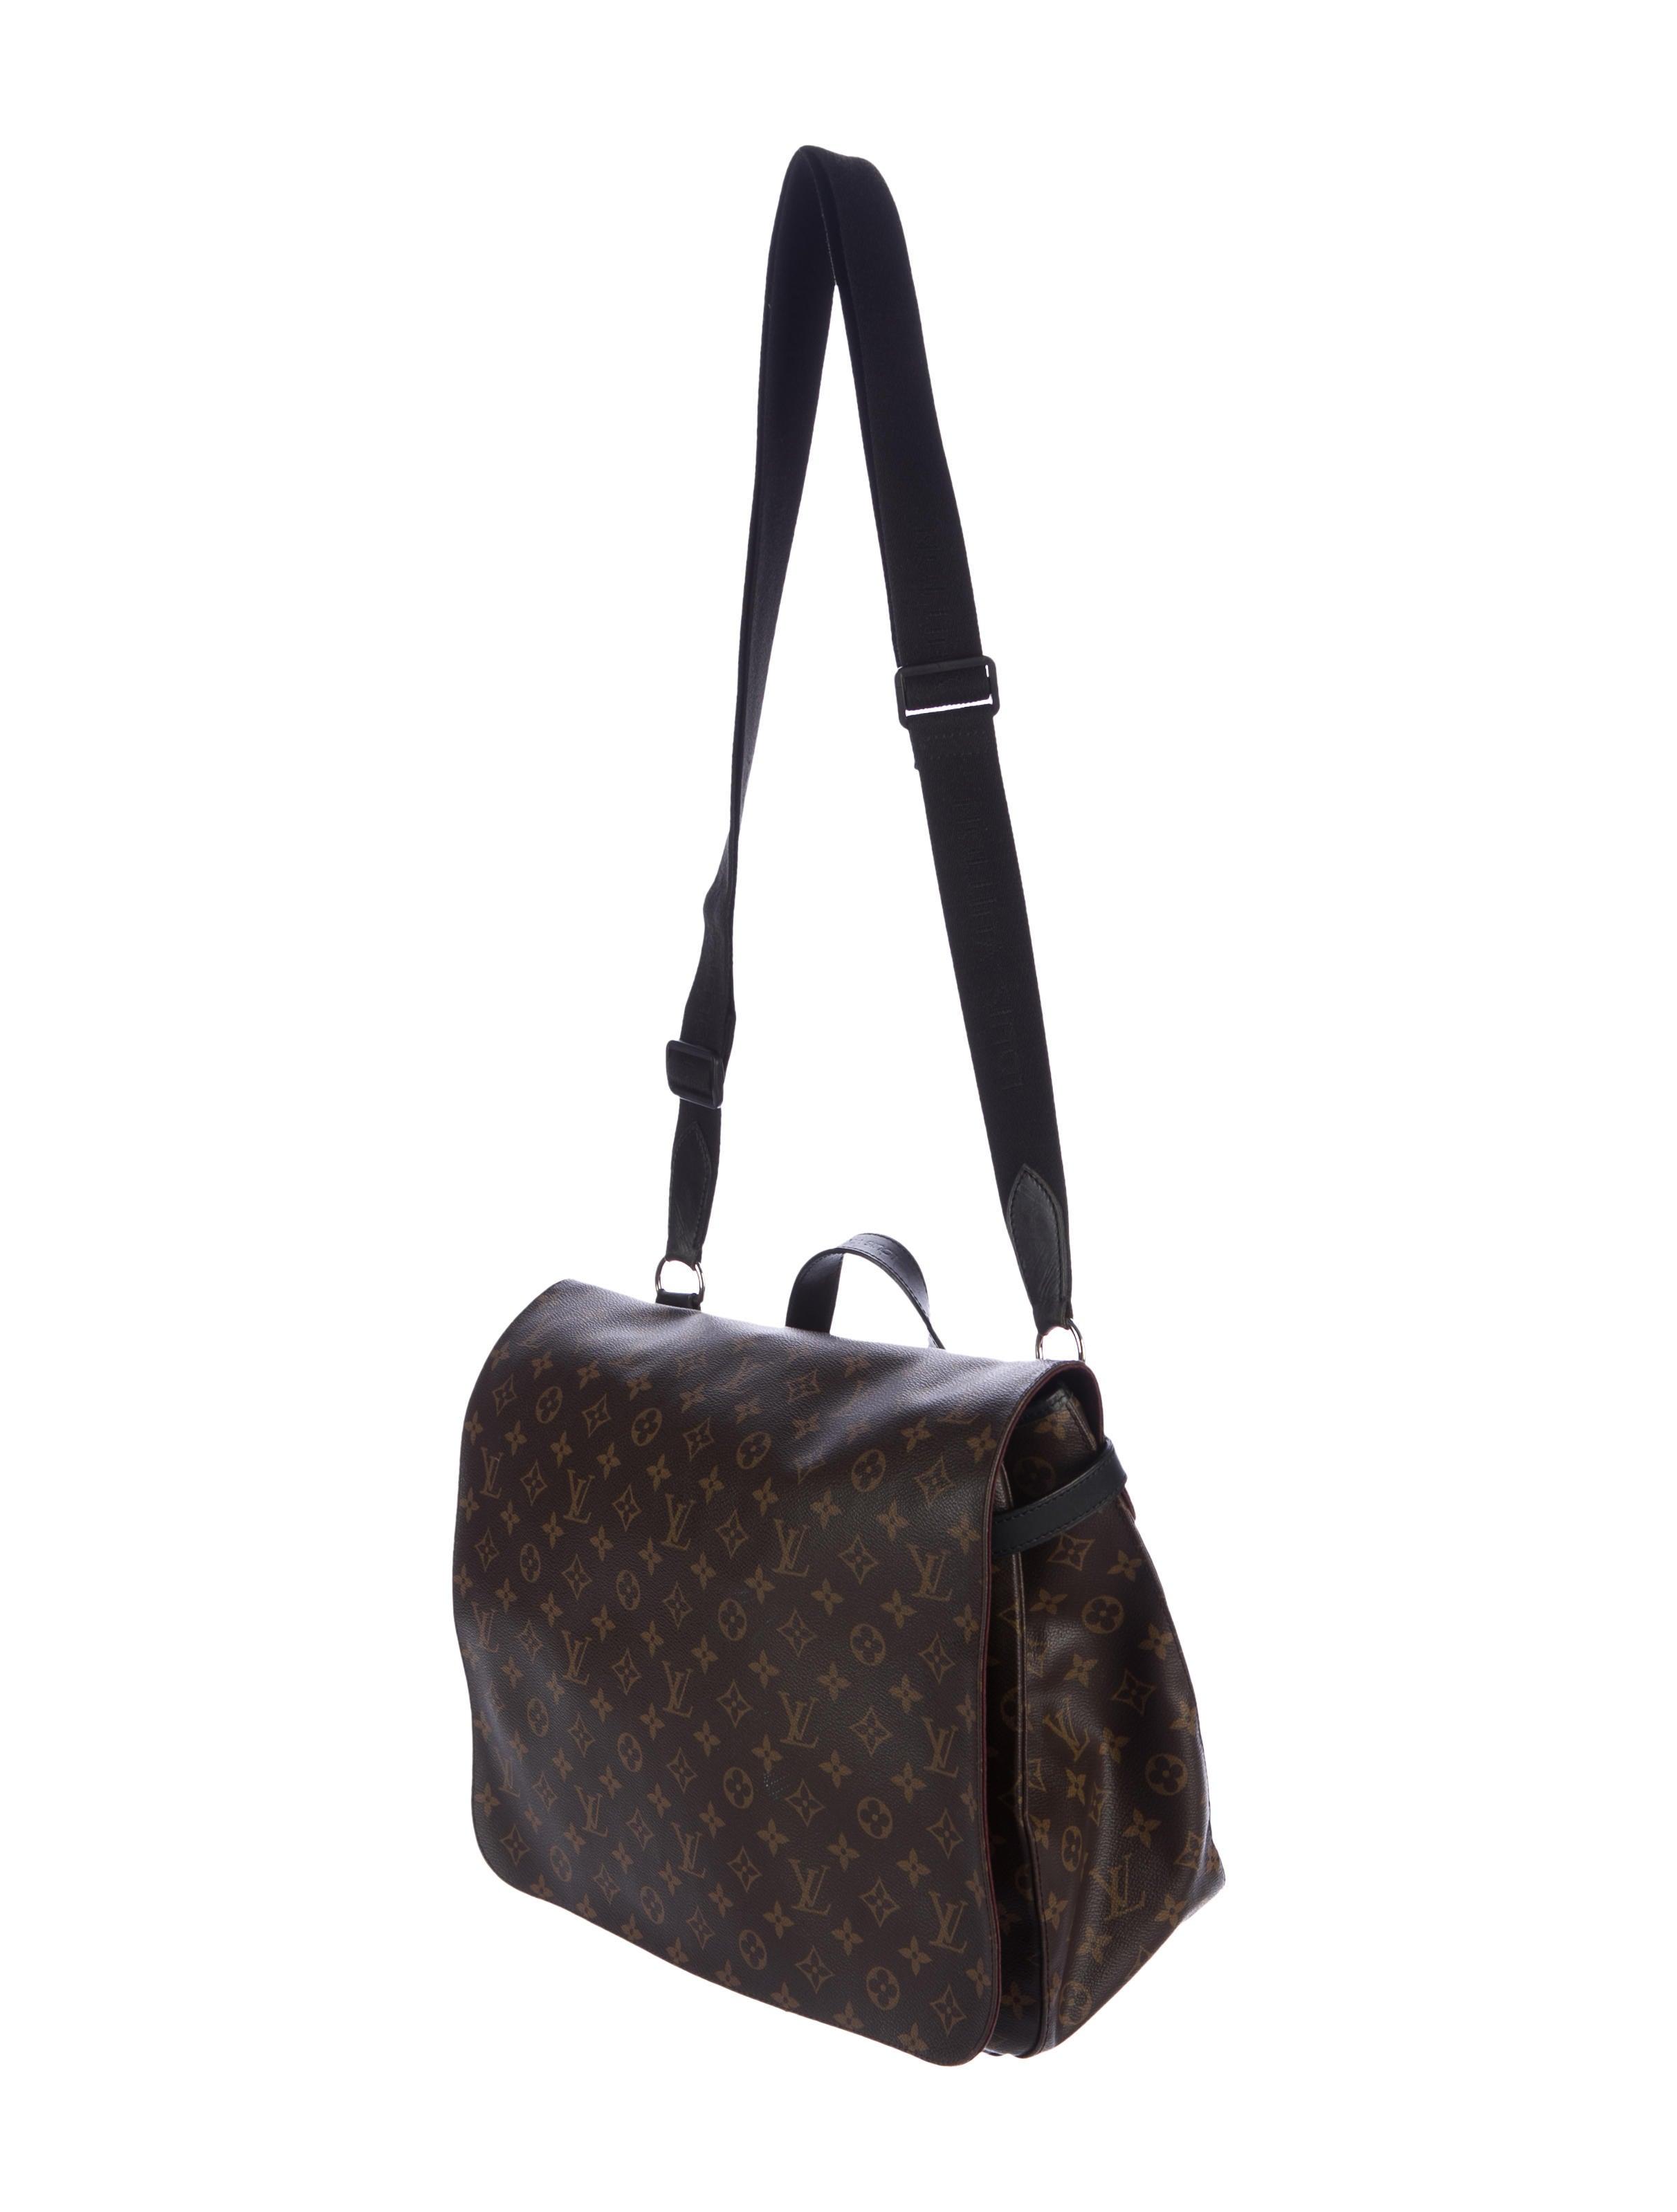 Louis Vuitton Monogram Macassar District Mm Bags